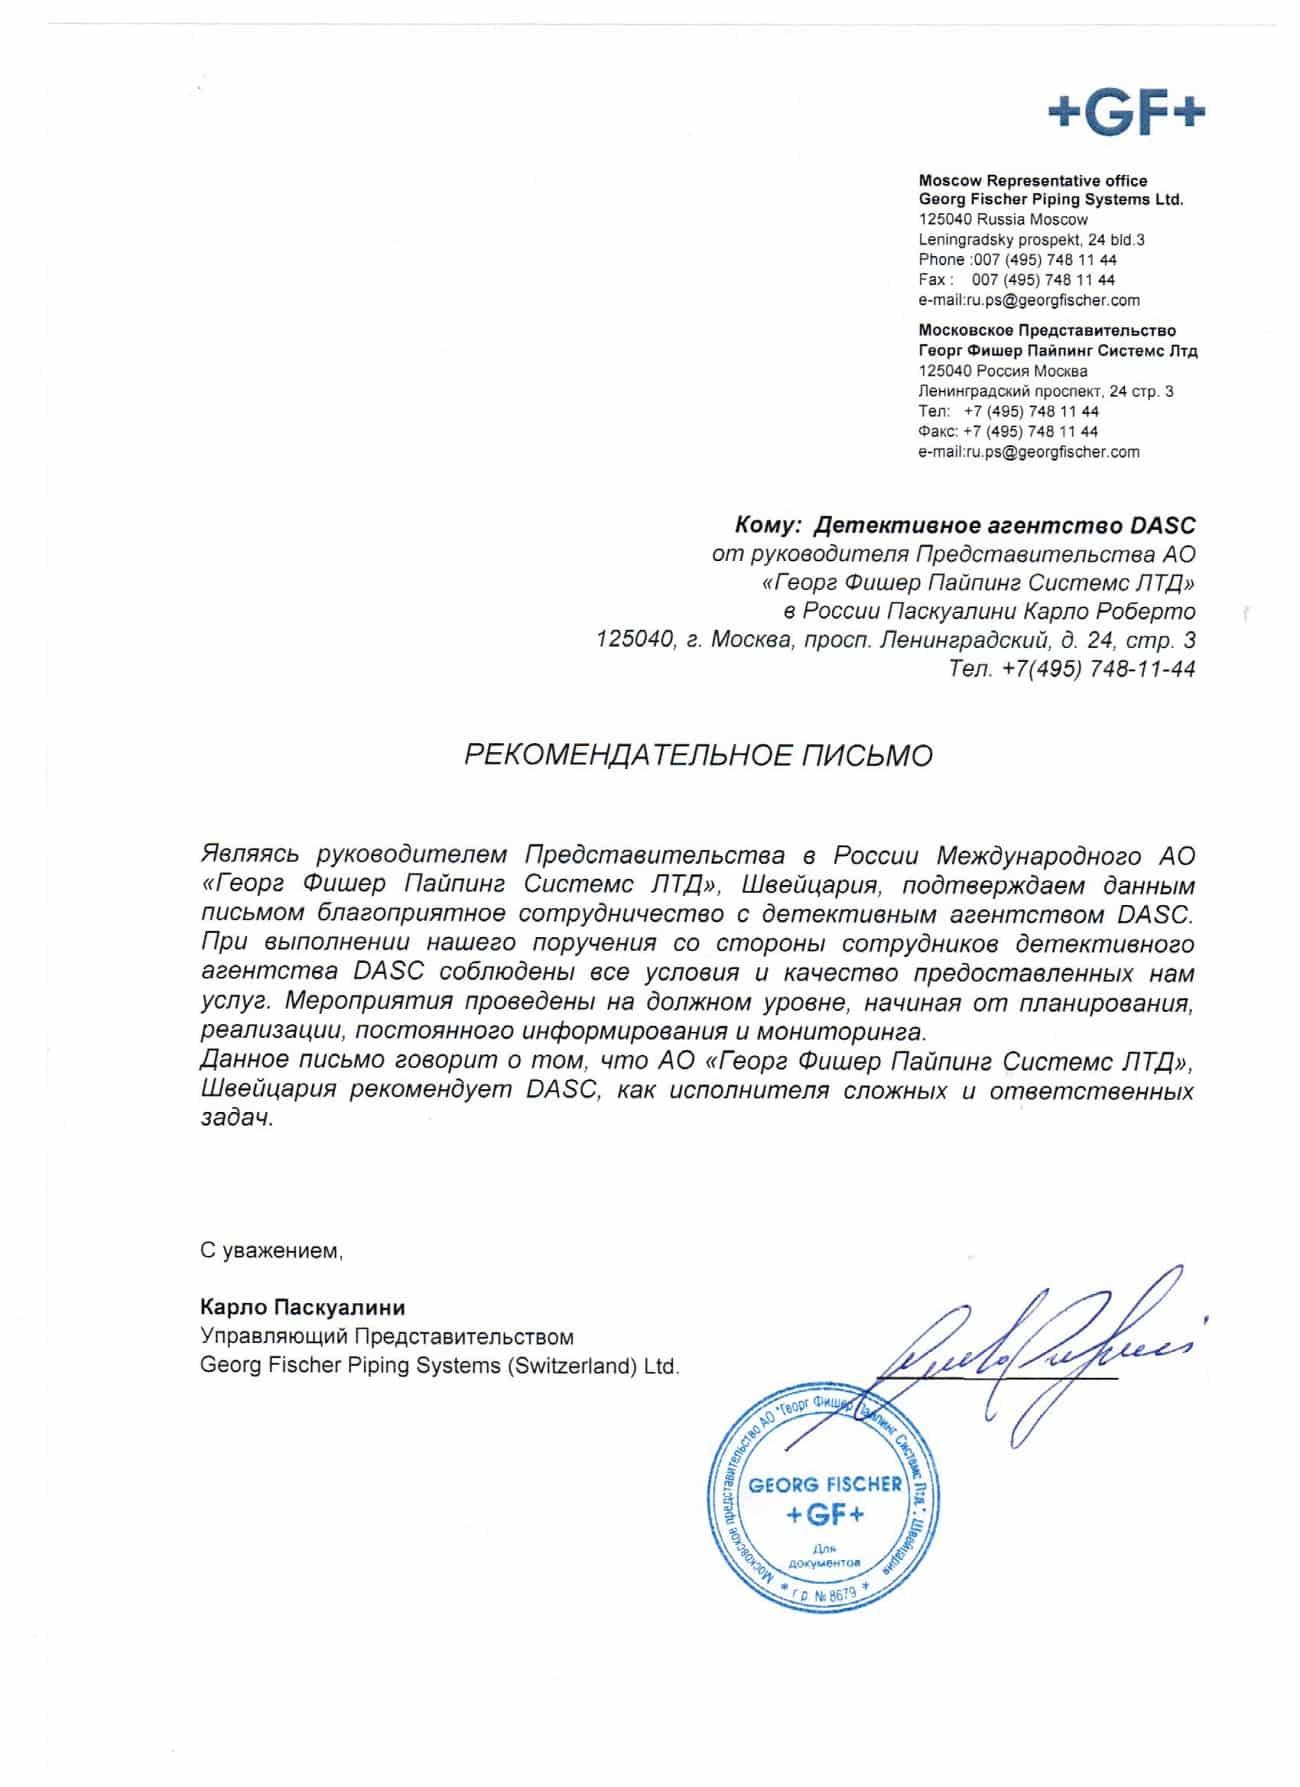 Благодарность детективному агентству DASC от Георг Фишер Пайпинг Системс ЛТД